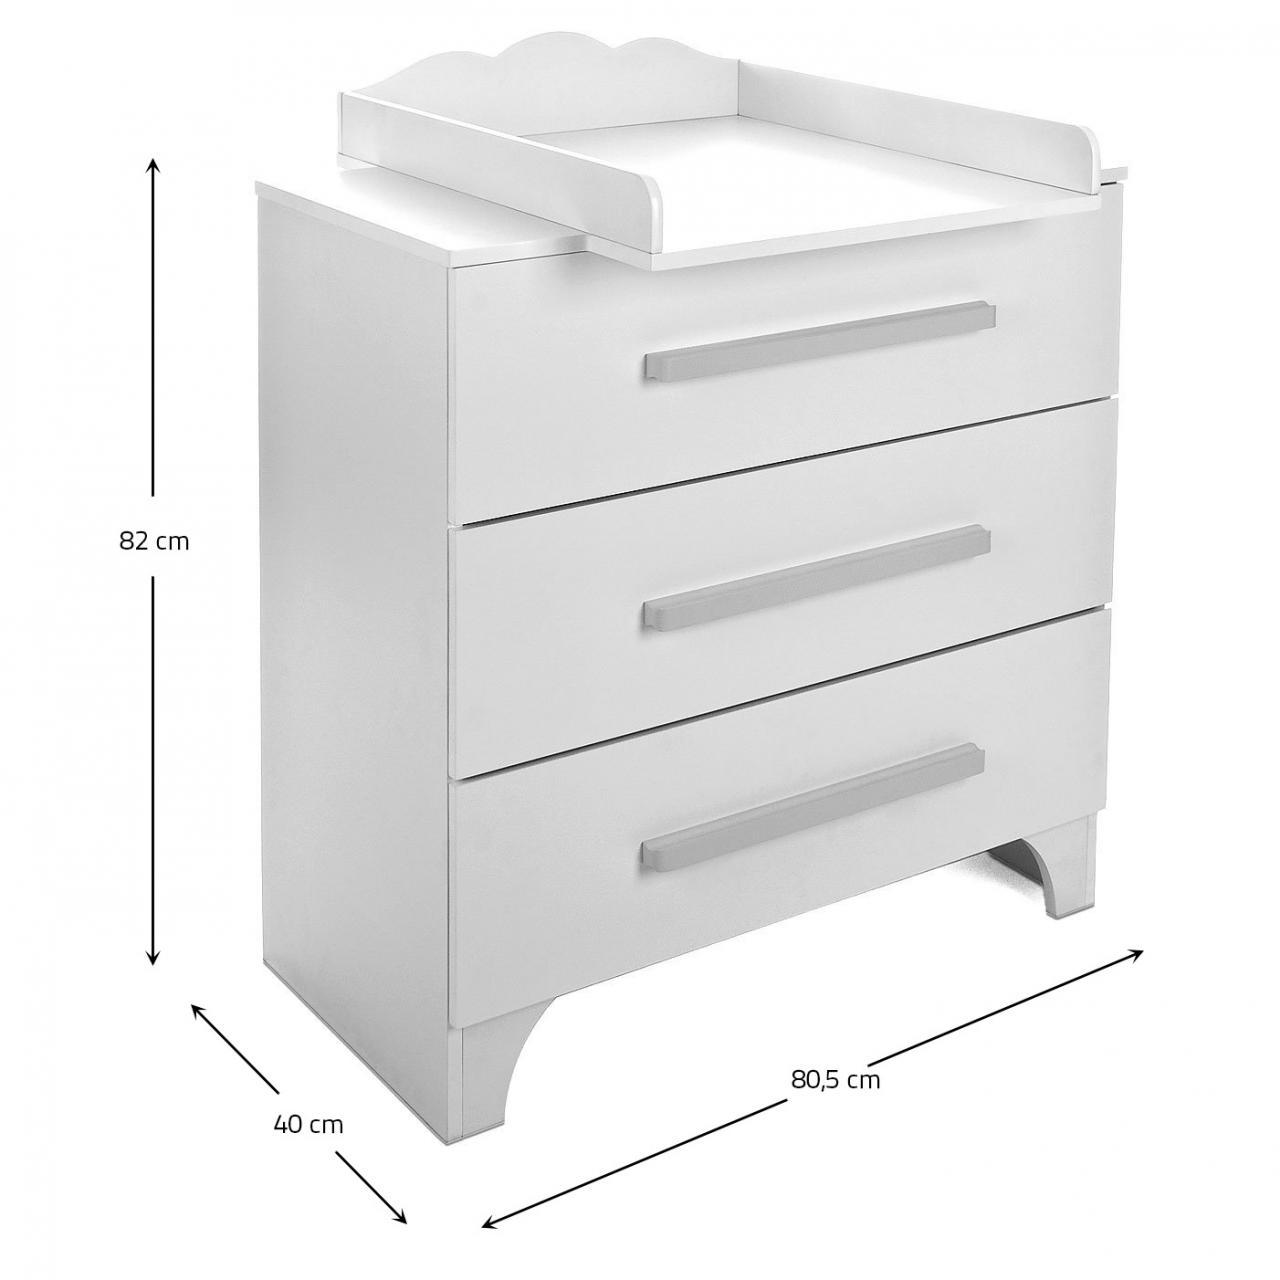 babyzimmer babybett mit wickelkommode gitterbett kinderbett komplett set neu ebay. Black Bedroom Furniture Sets. Home Design Ideas